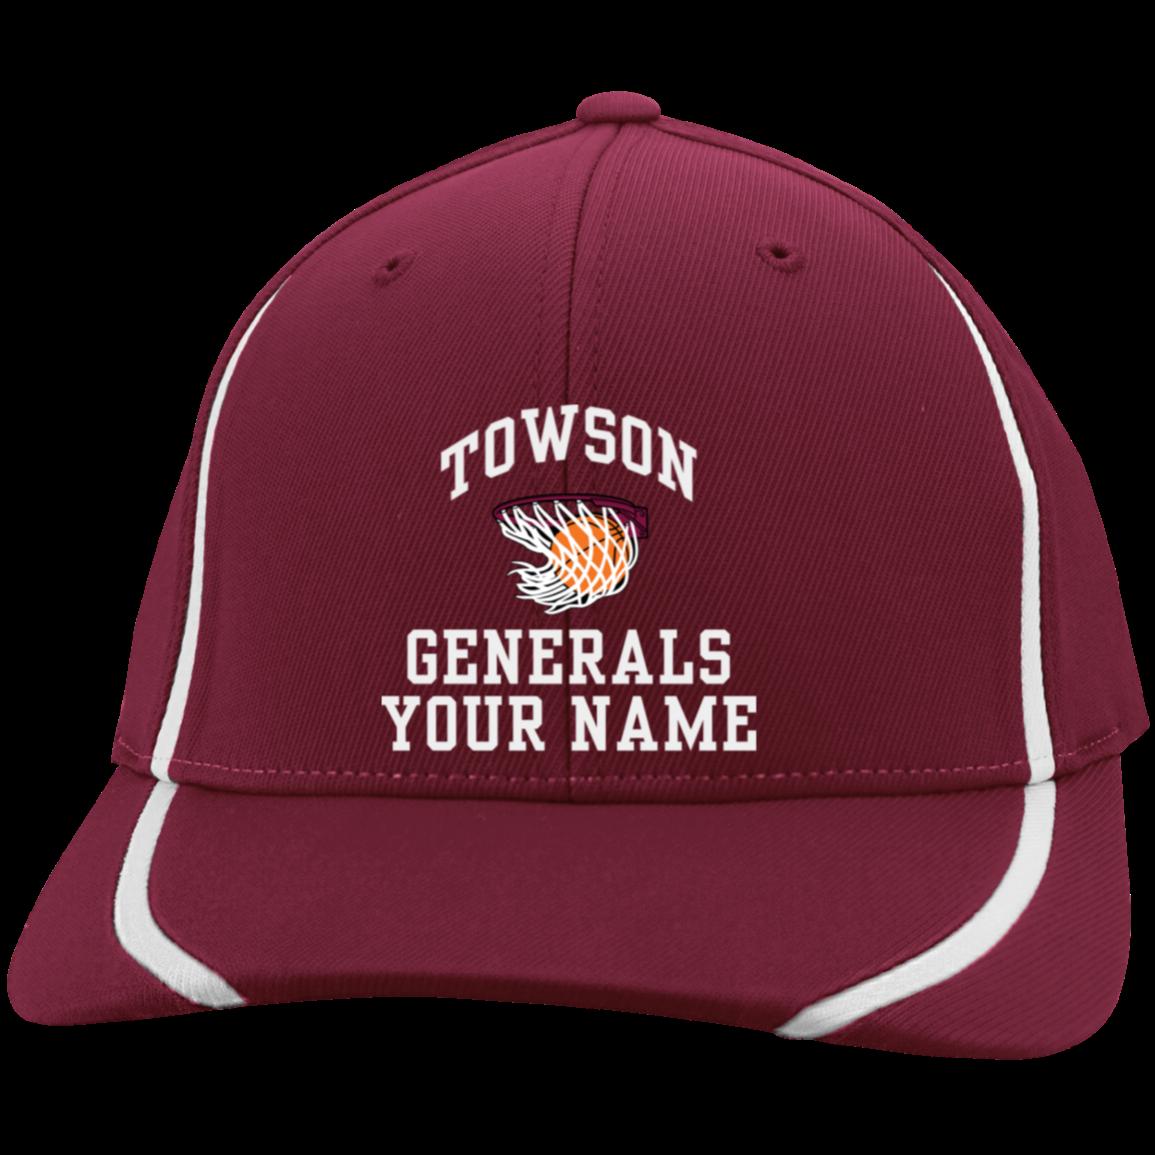 Towson High School Flexfit Colorblock Cap - Jostens School